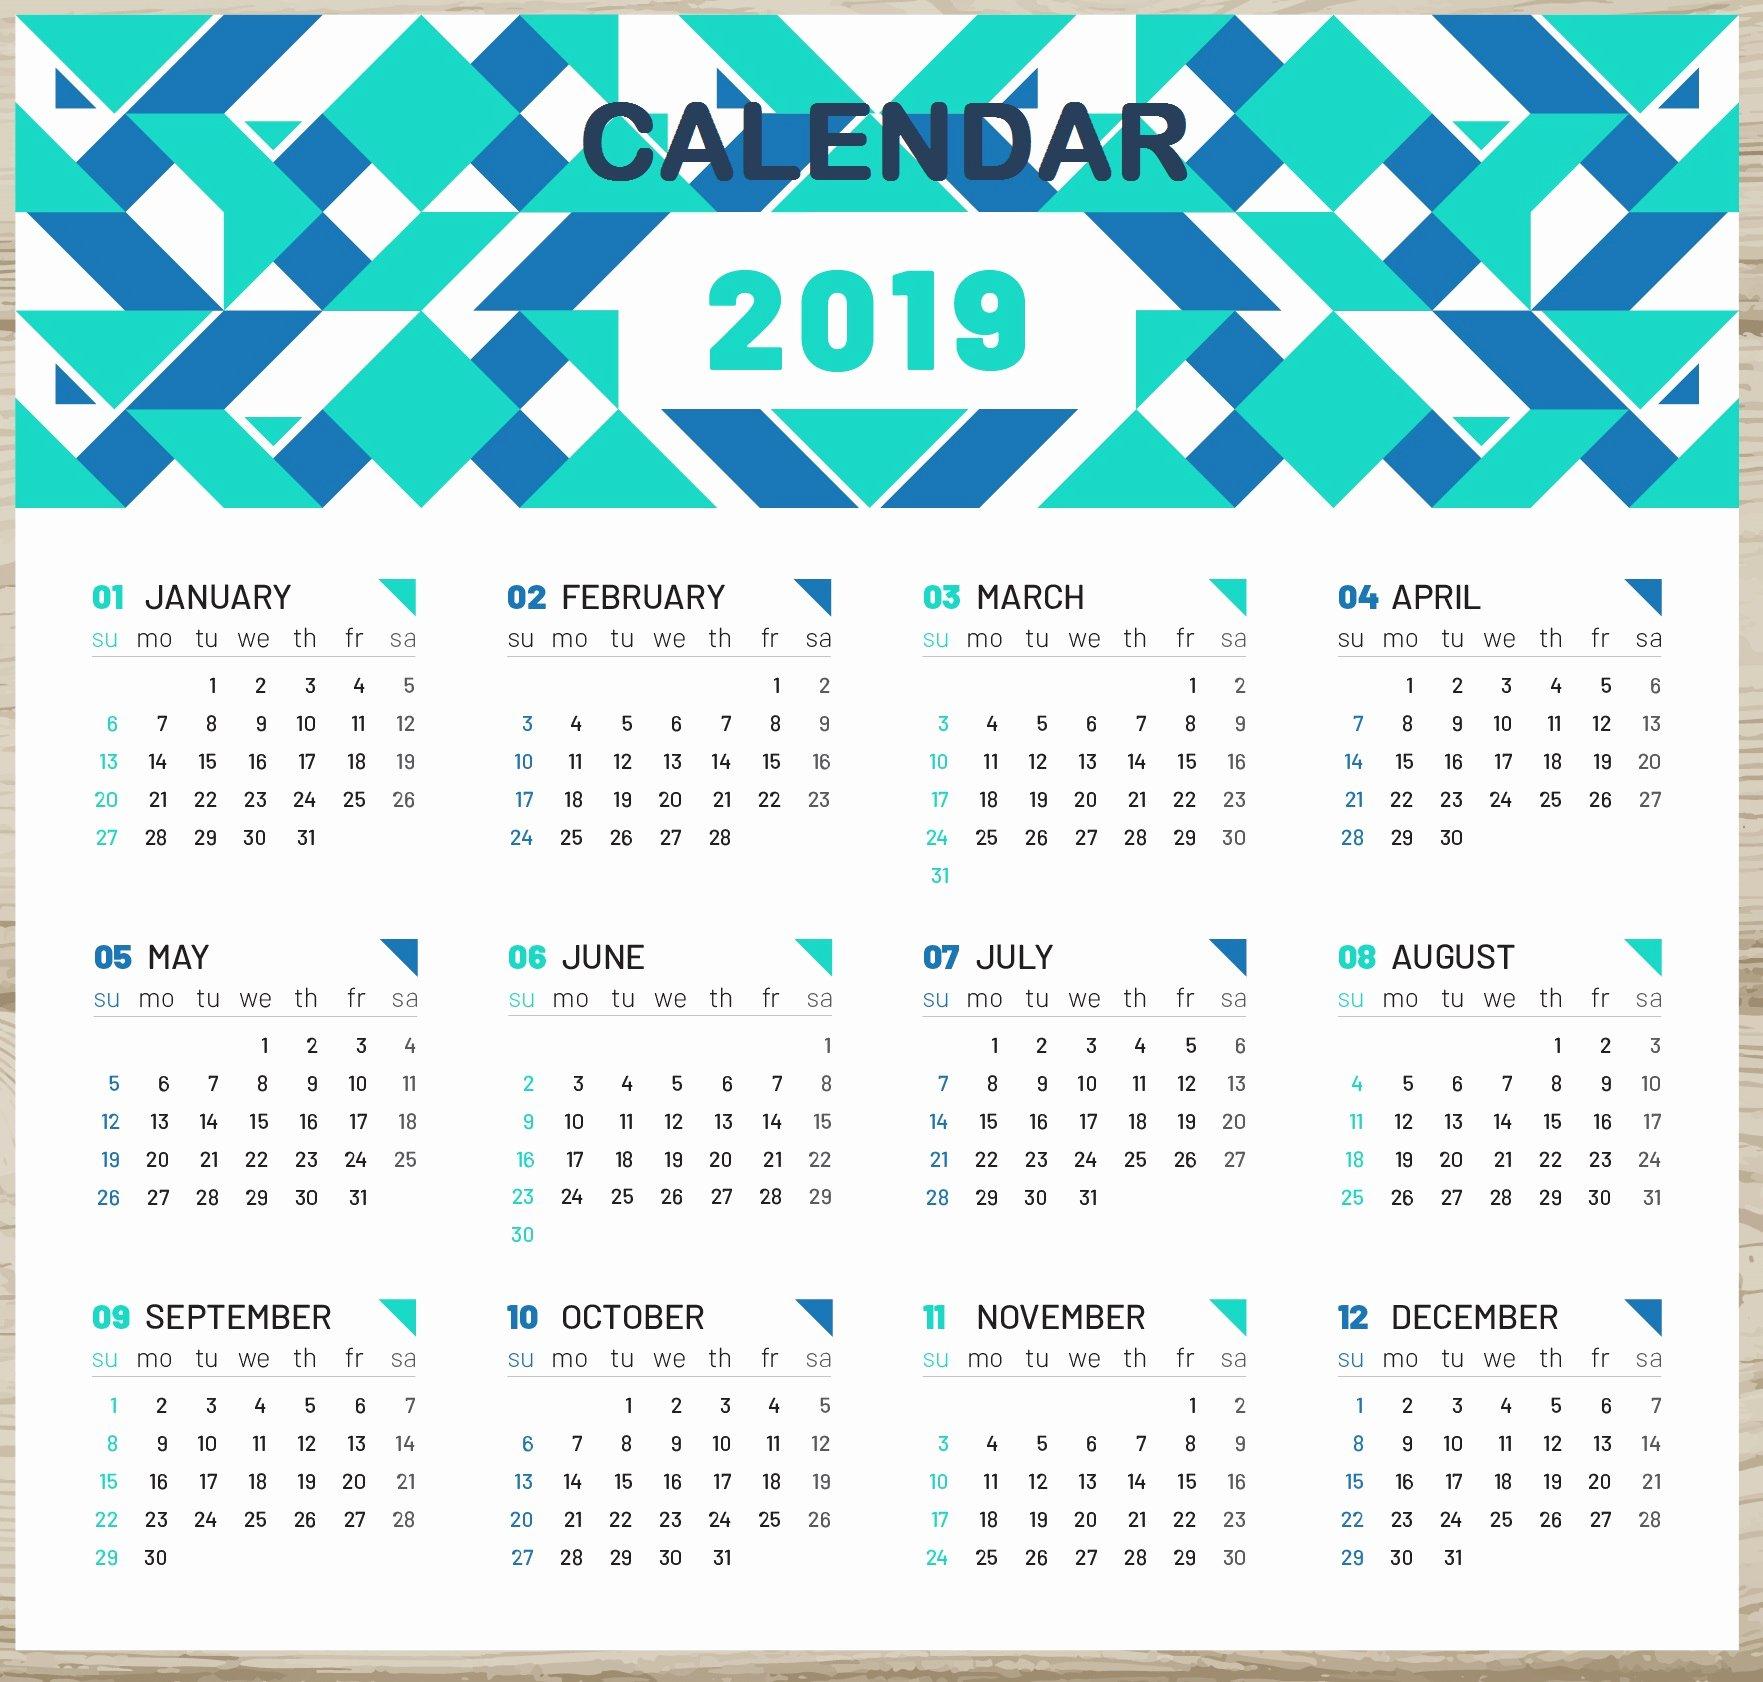 Microsoft Office Calendar Templates 2019 Lovely 2019 Calendar with Week Numbers Printable